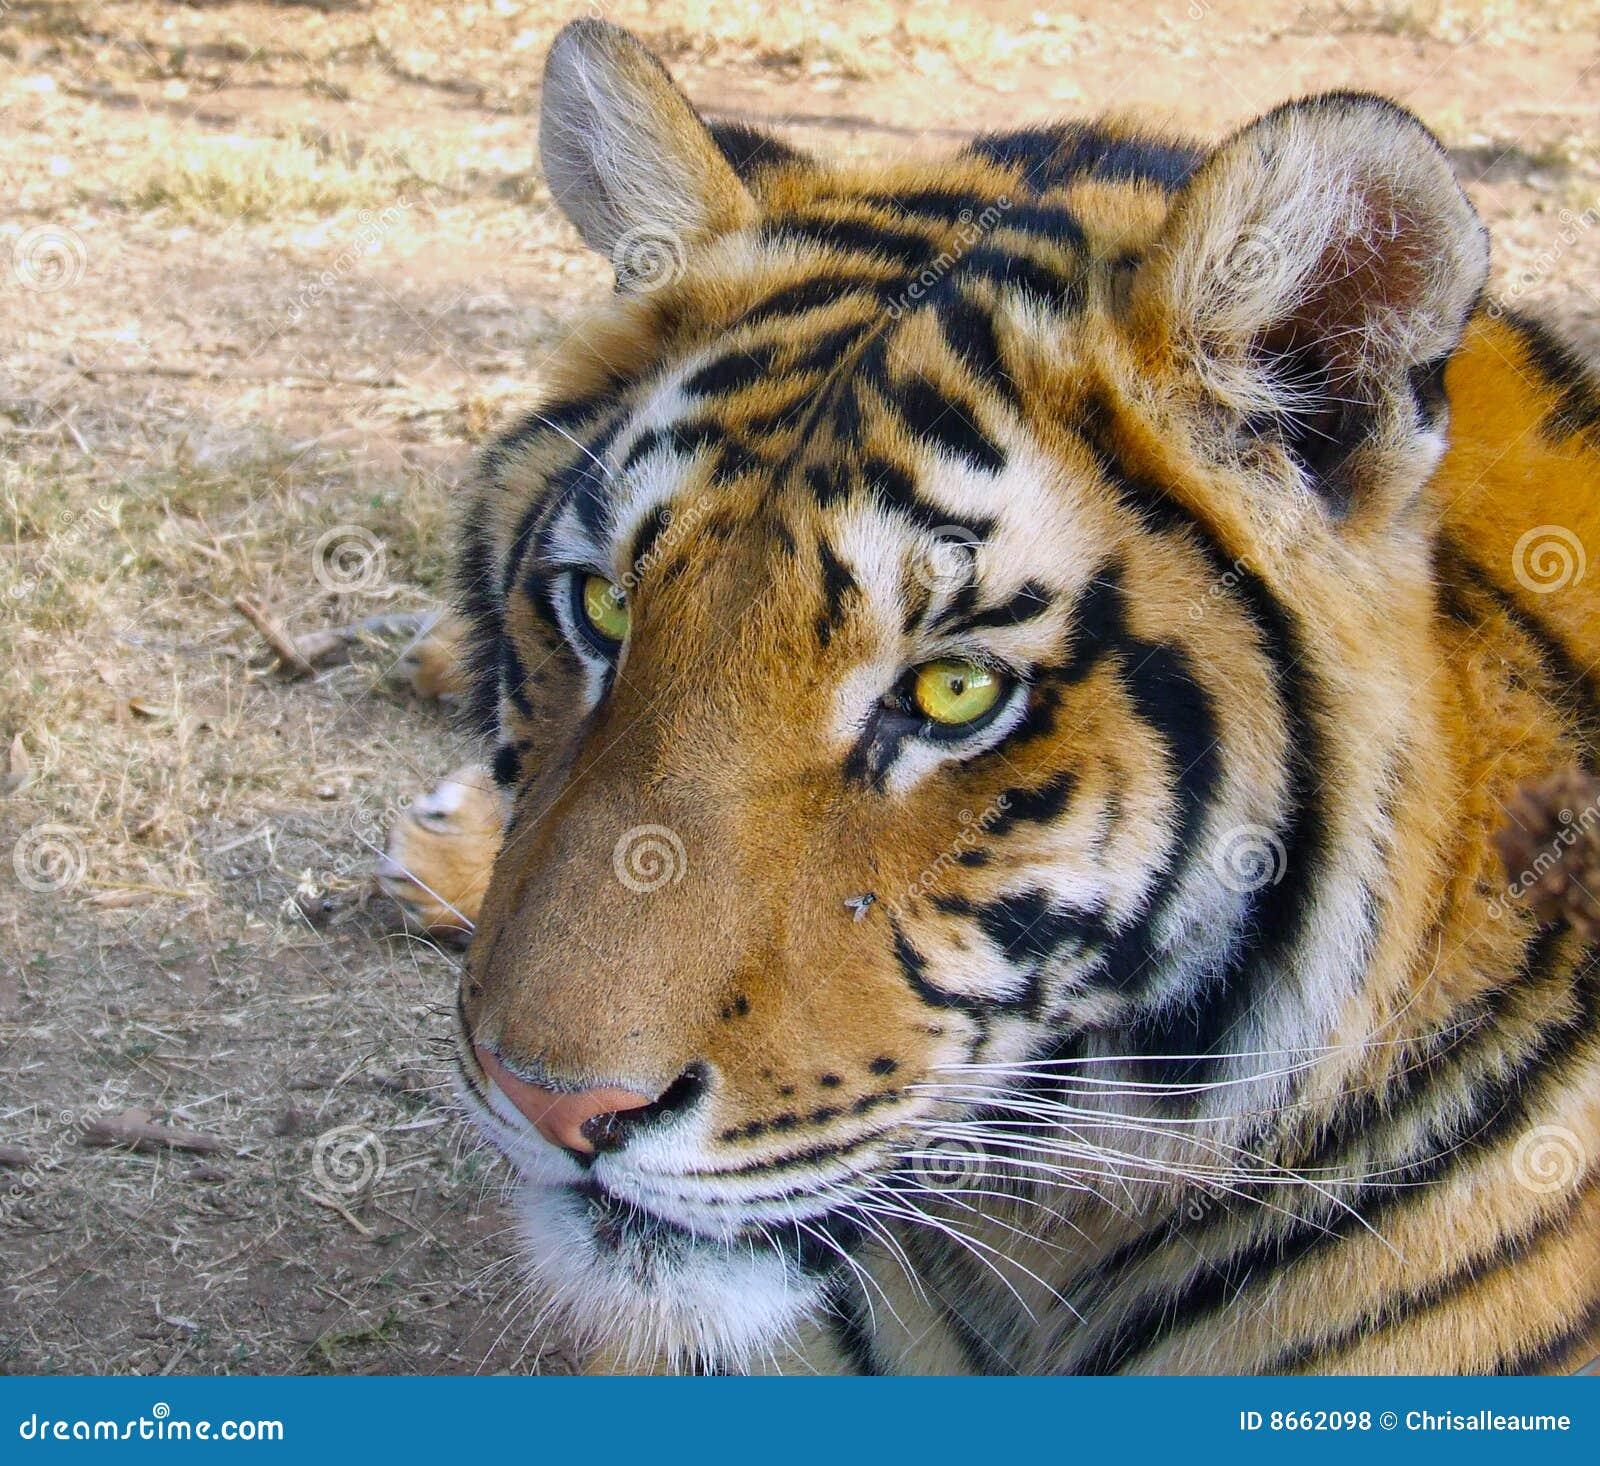 Tigres percés en vrille de yeux